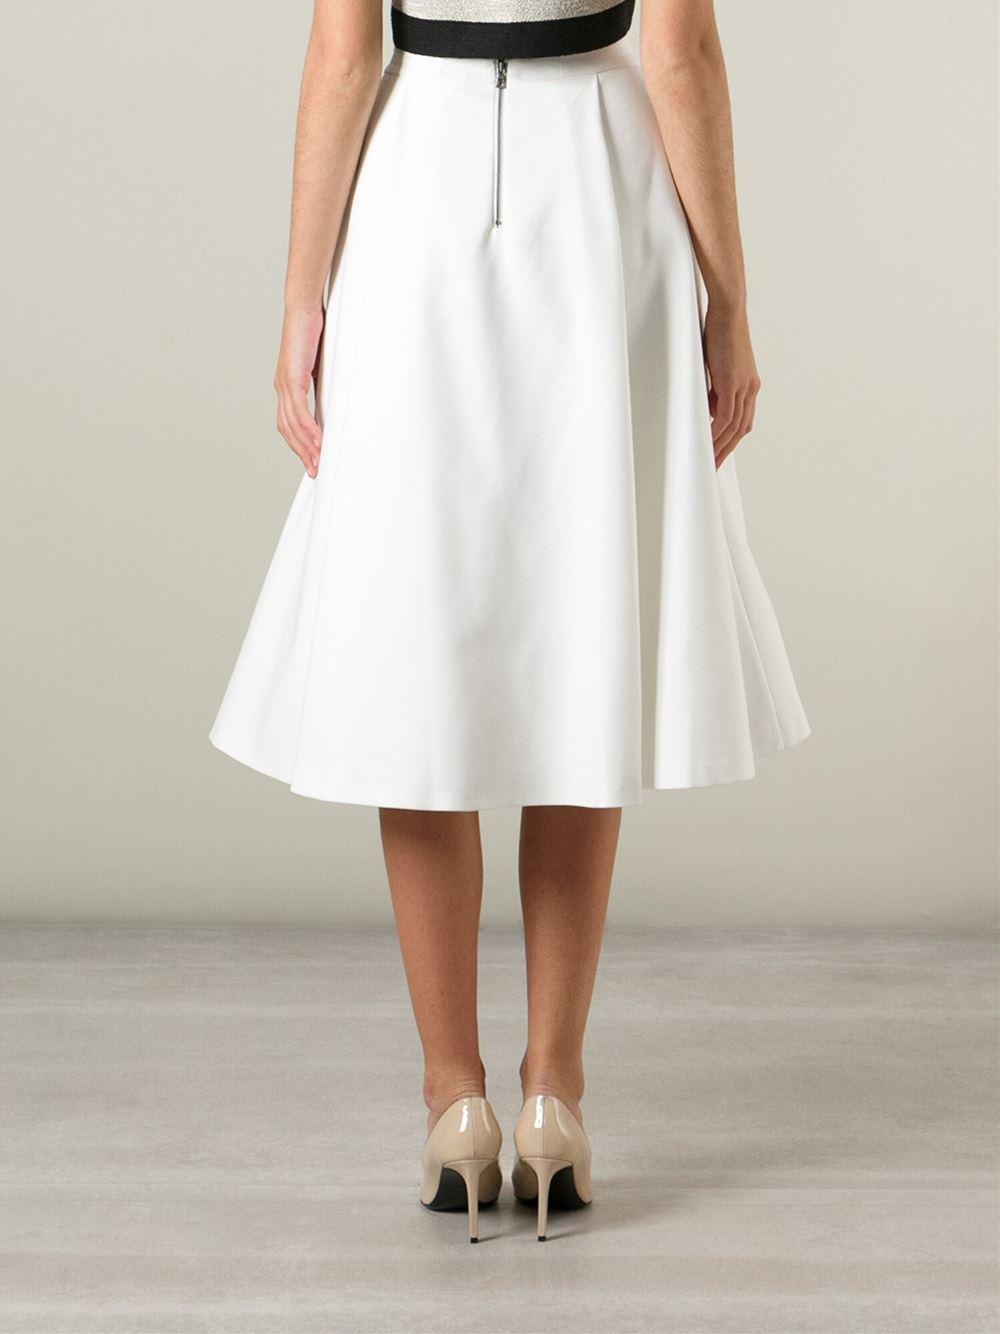 510c17dd9 Alice + Olivia Box Pleat Midi Skirt in White - Lyst